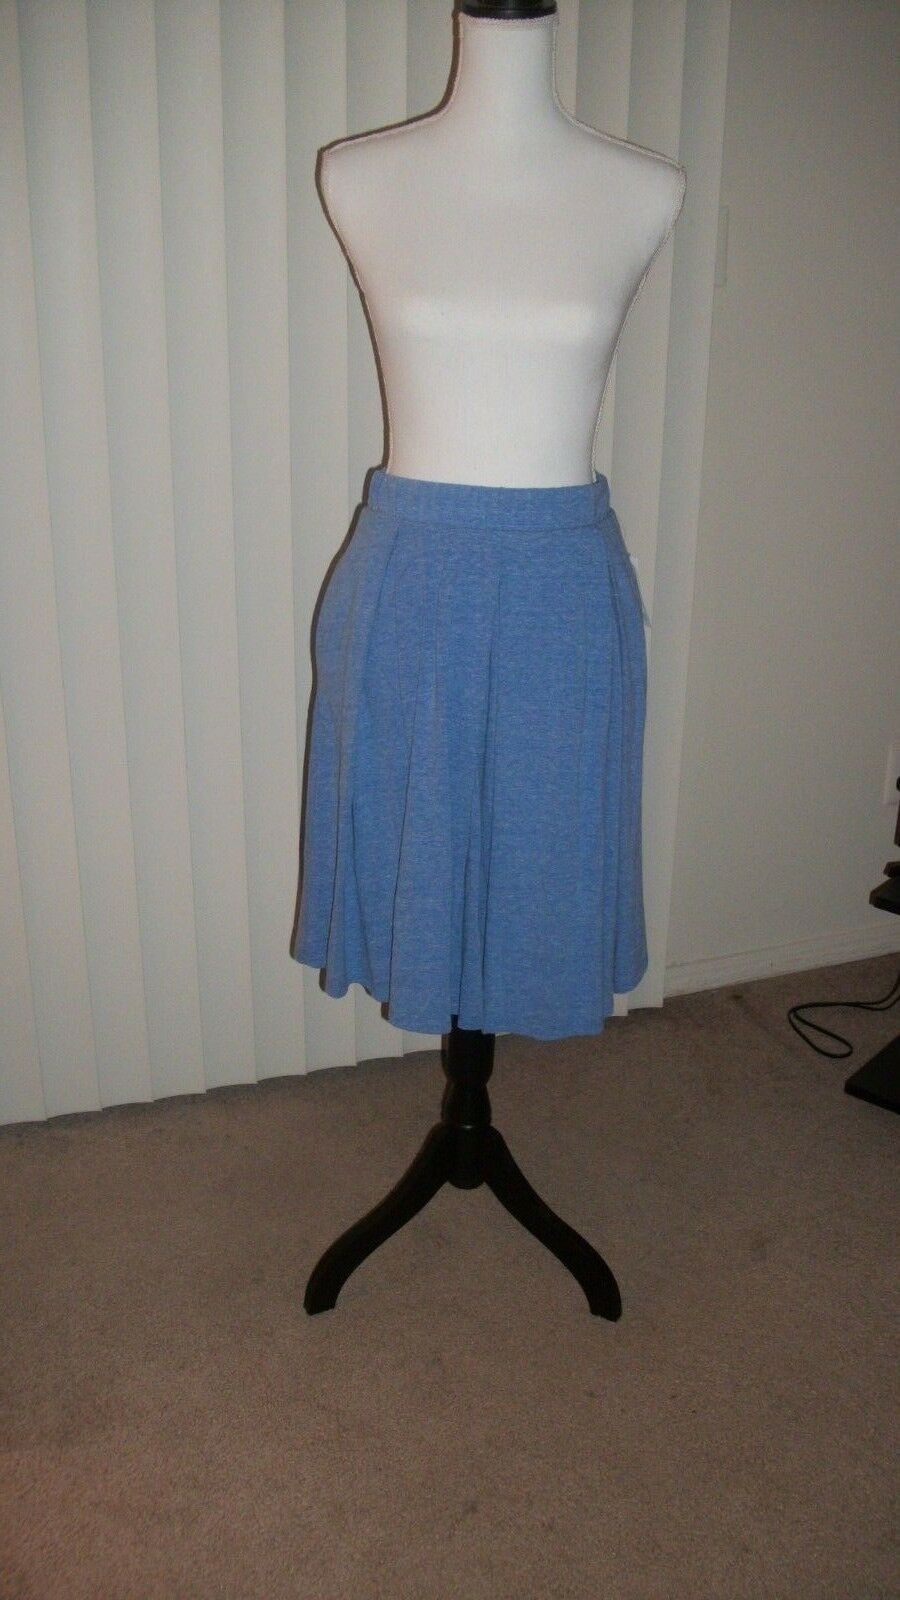 NWT LULAROE MADISON-Knit Pleated Skirt-Denim bluee-Size M